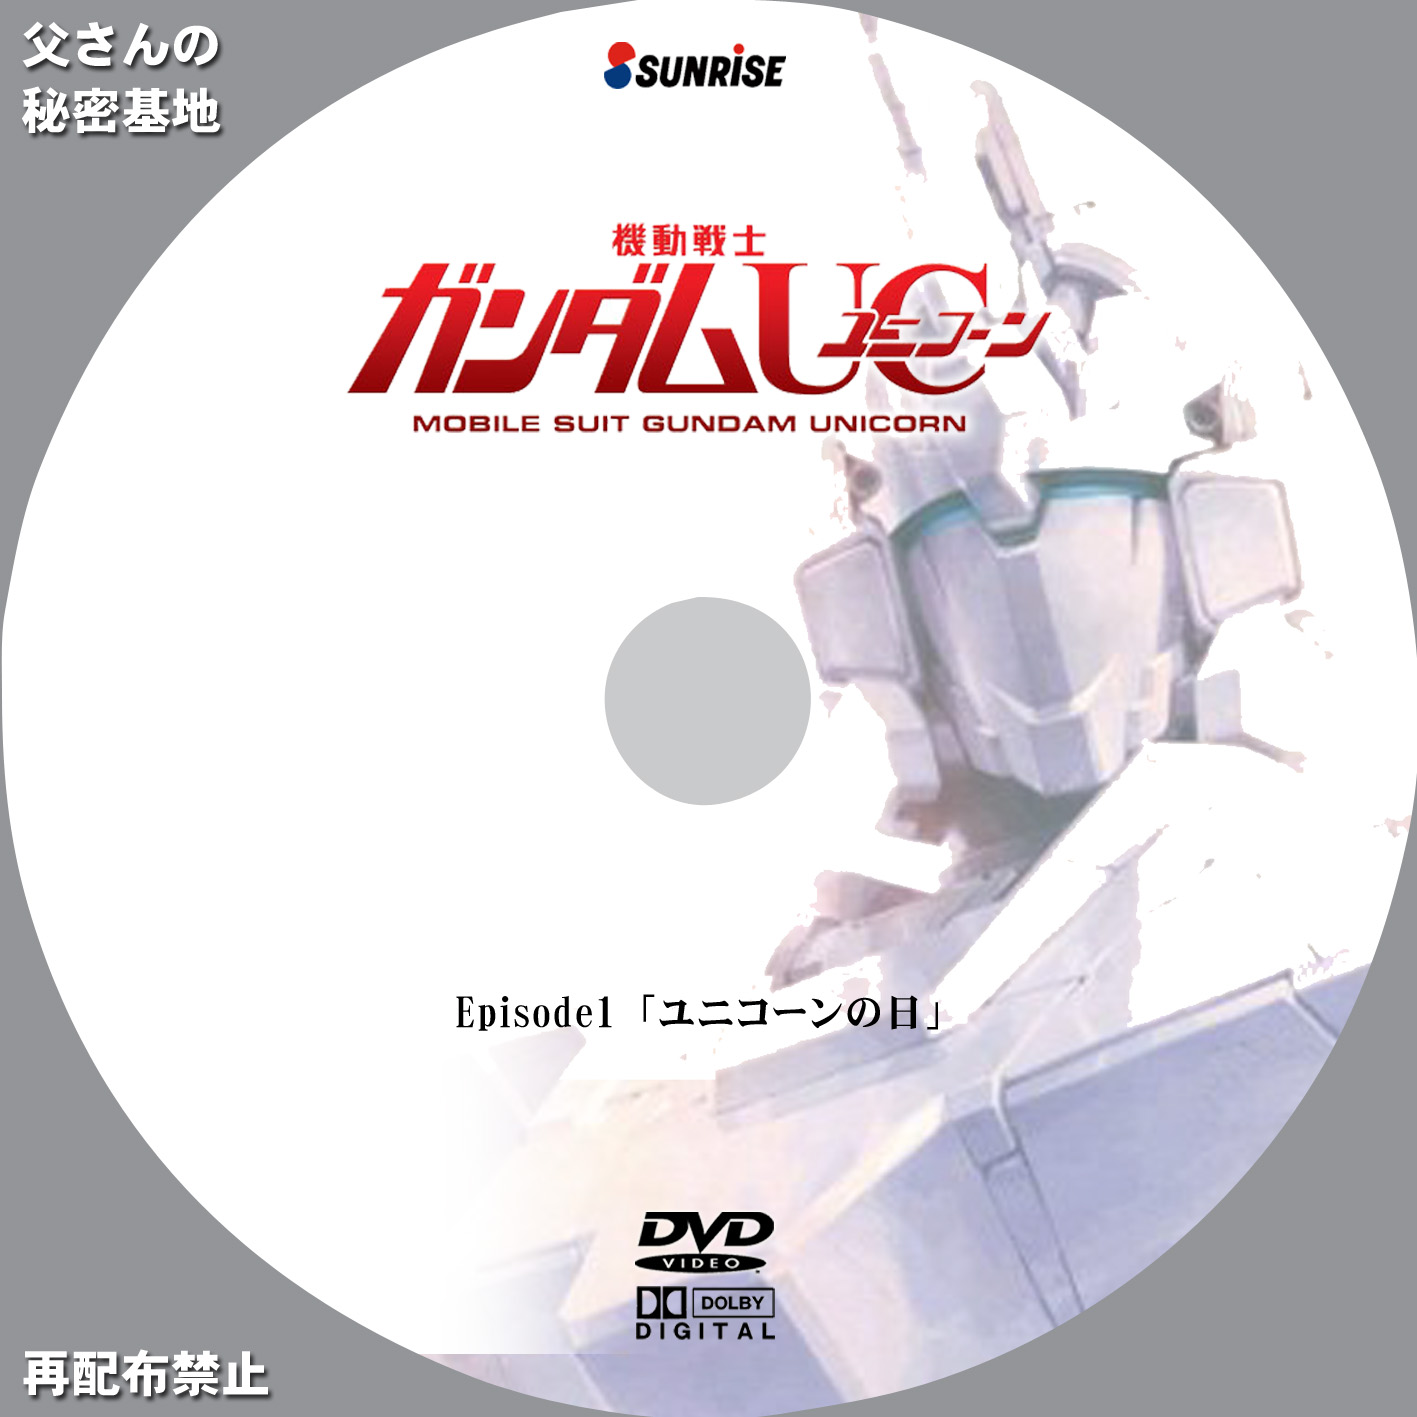 UNICORN_01_DVD.jpg